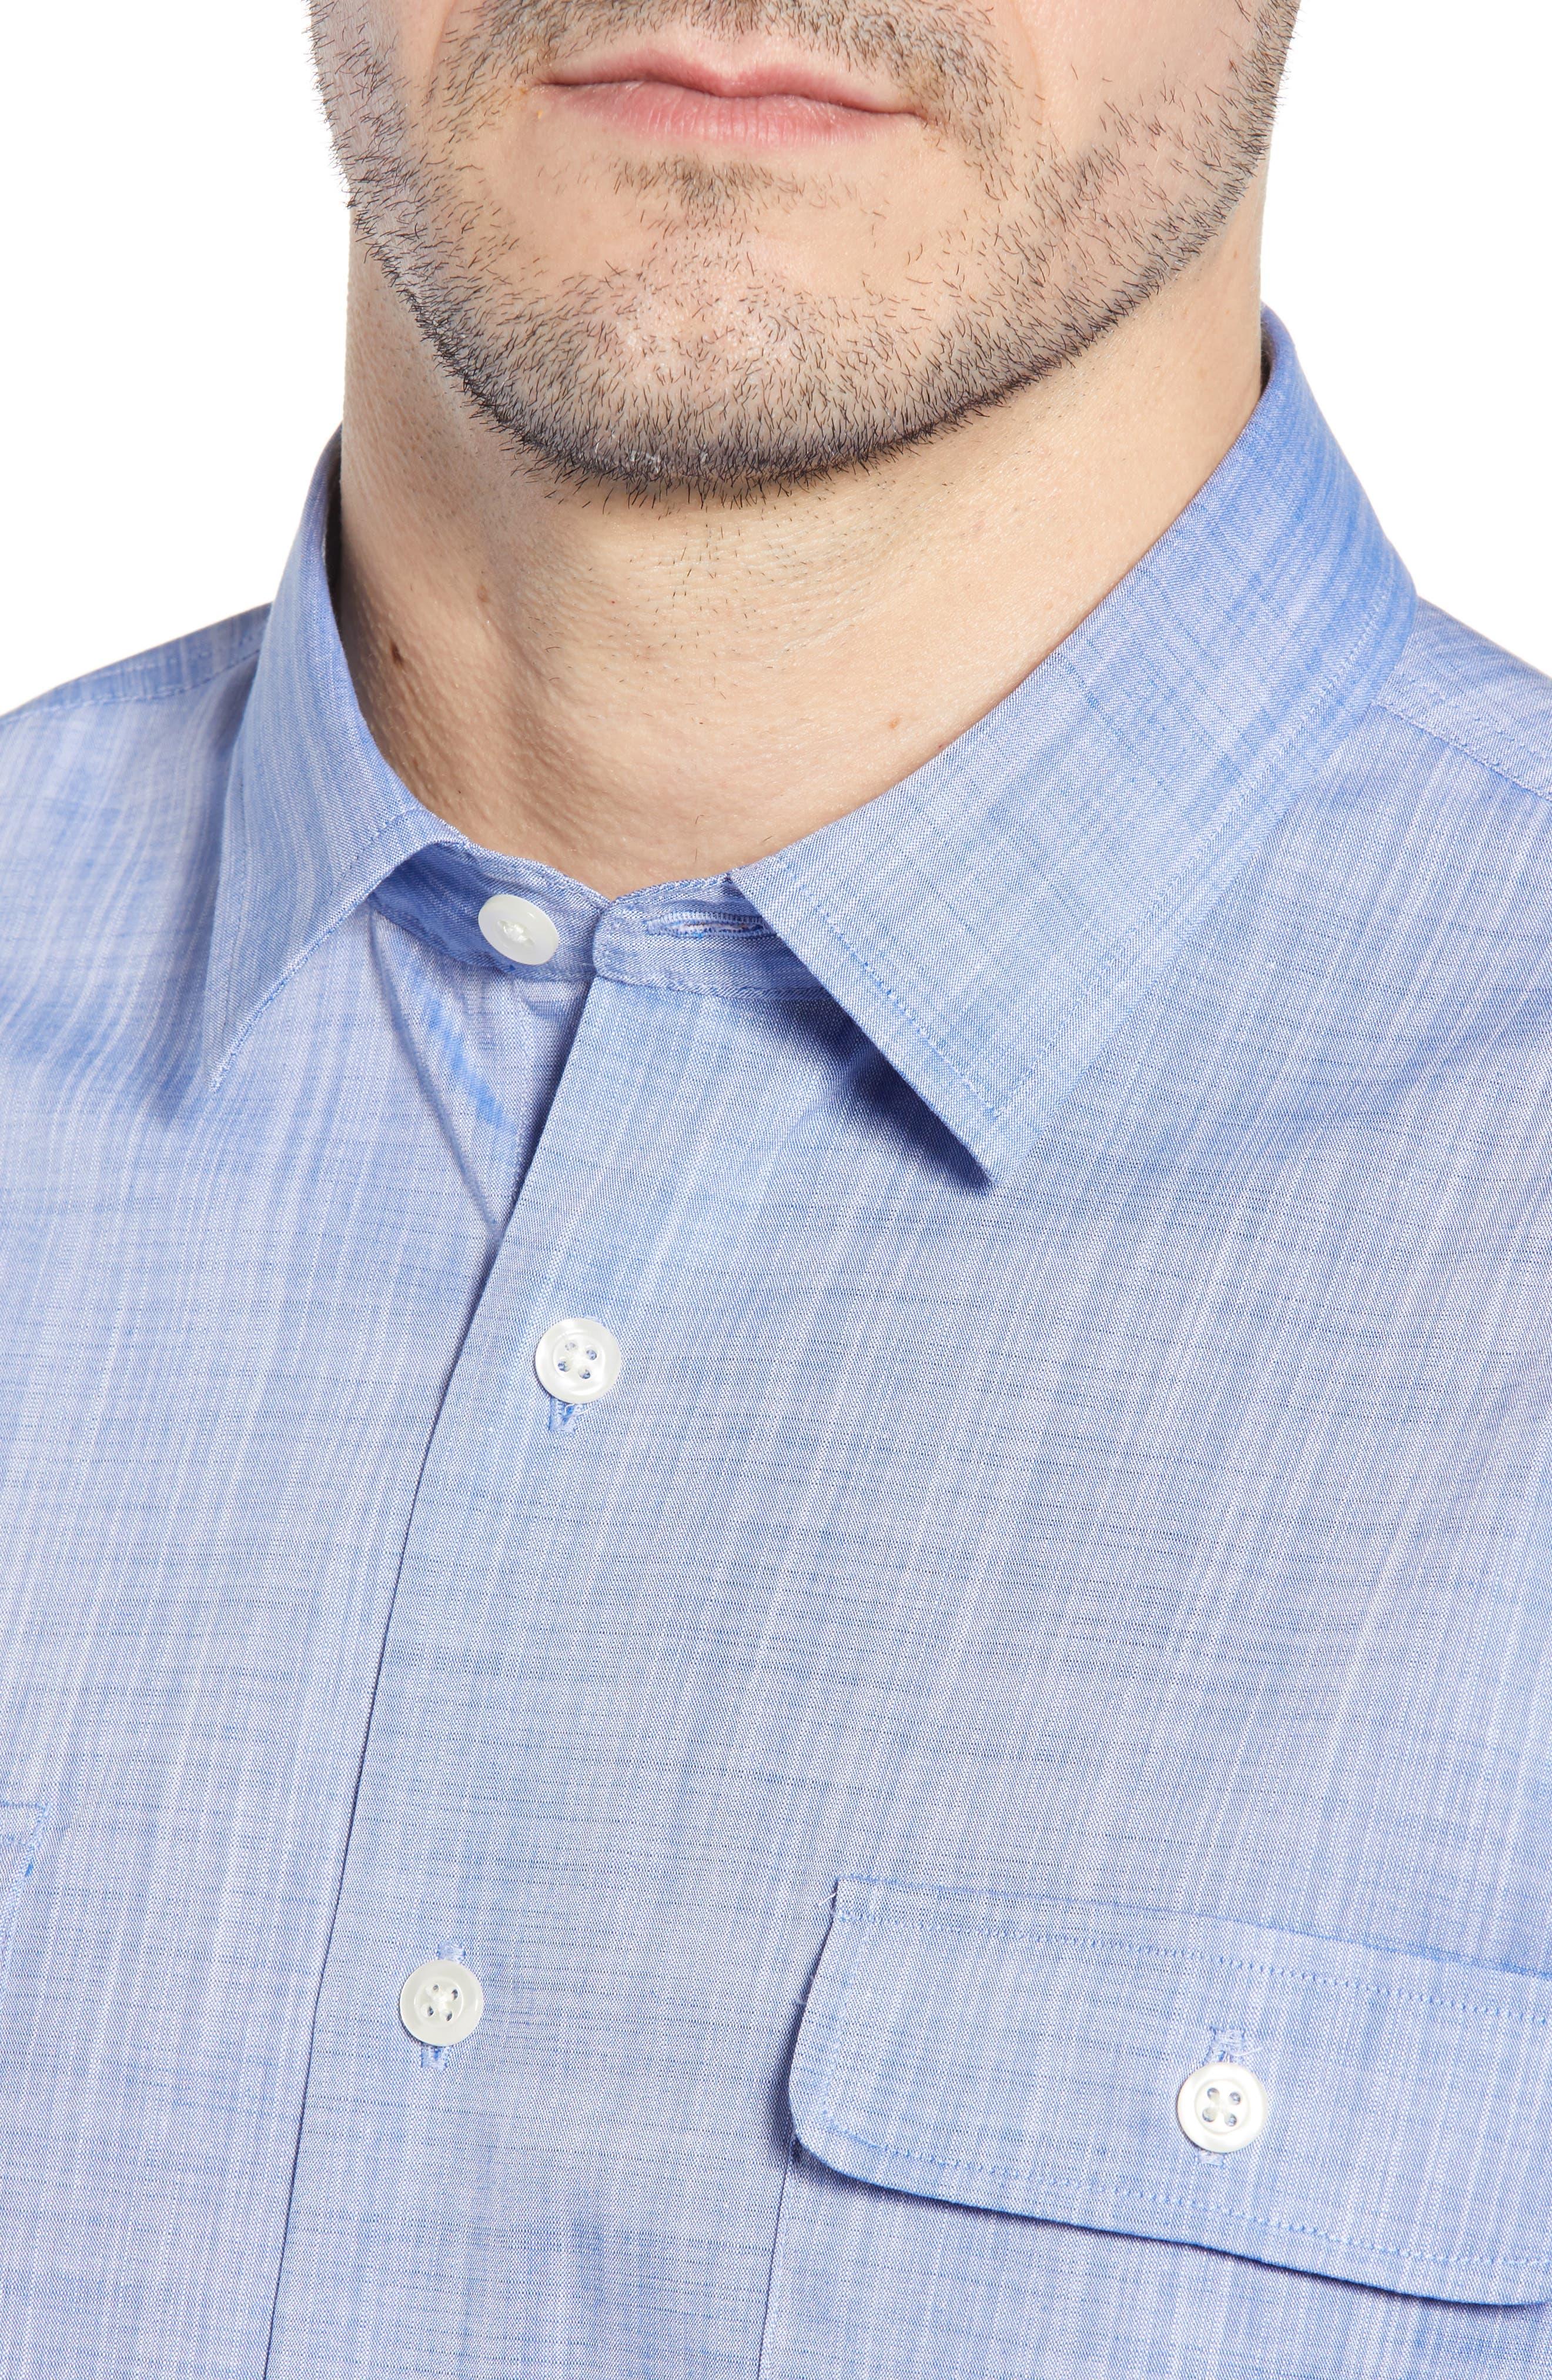 Hutton Classic Fit Shirt,                             Alternate thumbnail 2, color,                             Deep Water